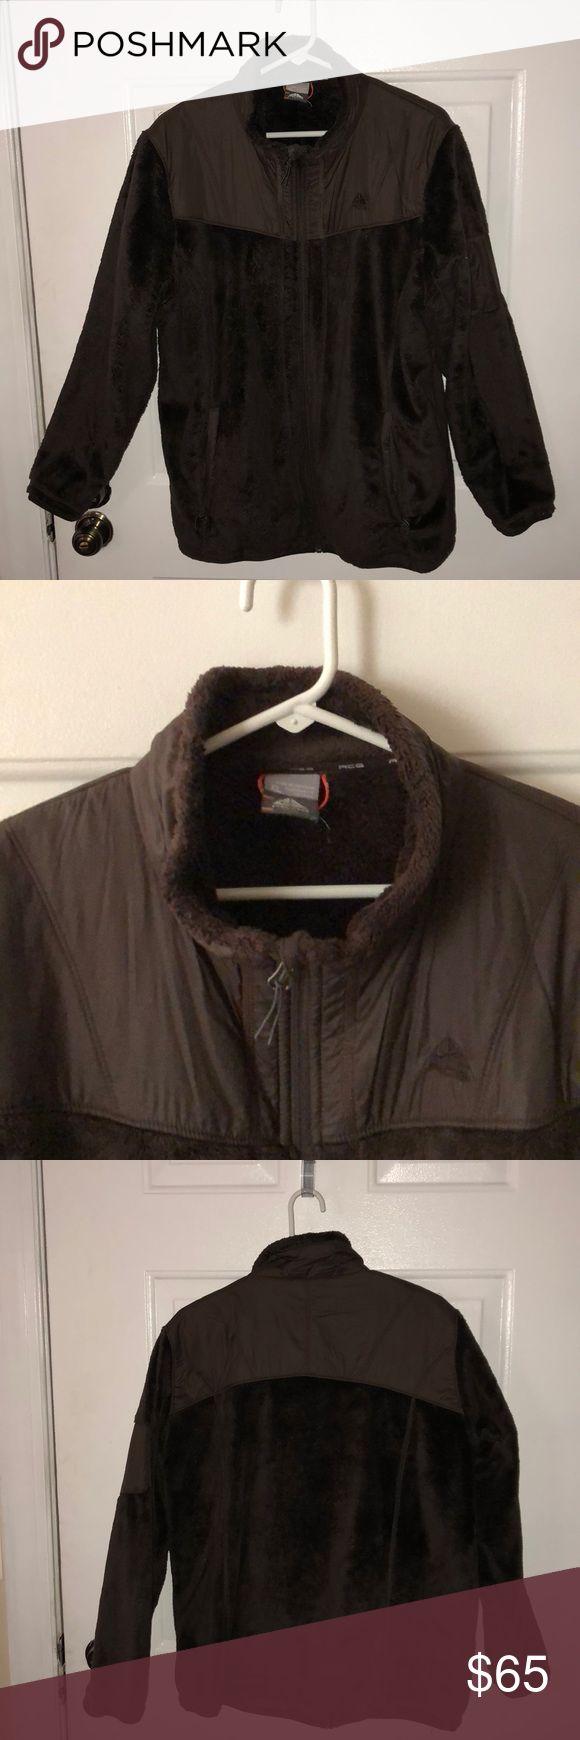 Nike ACG jacket Nike ACG jacket well kept. Great jacket, keeps you warm! Smoke free home. Nike ACG Jackets & Coats Utility Jackets